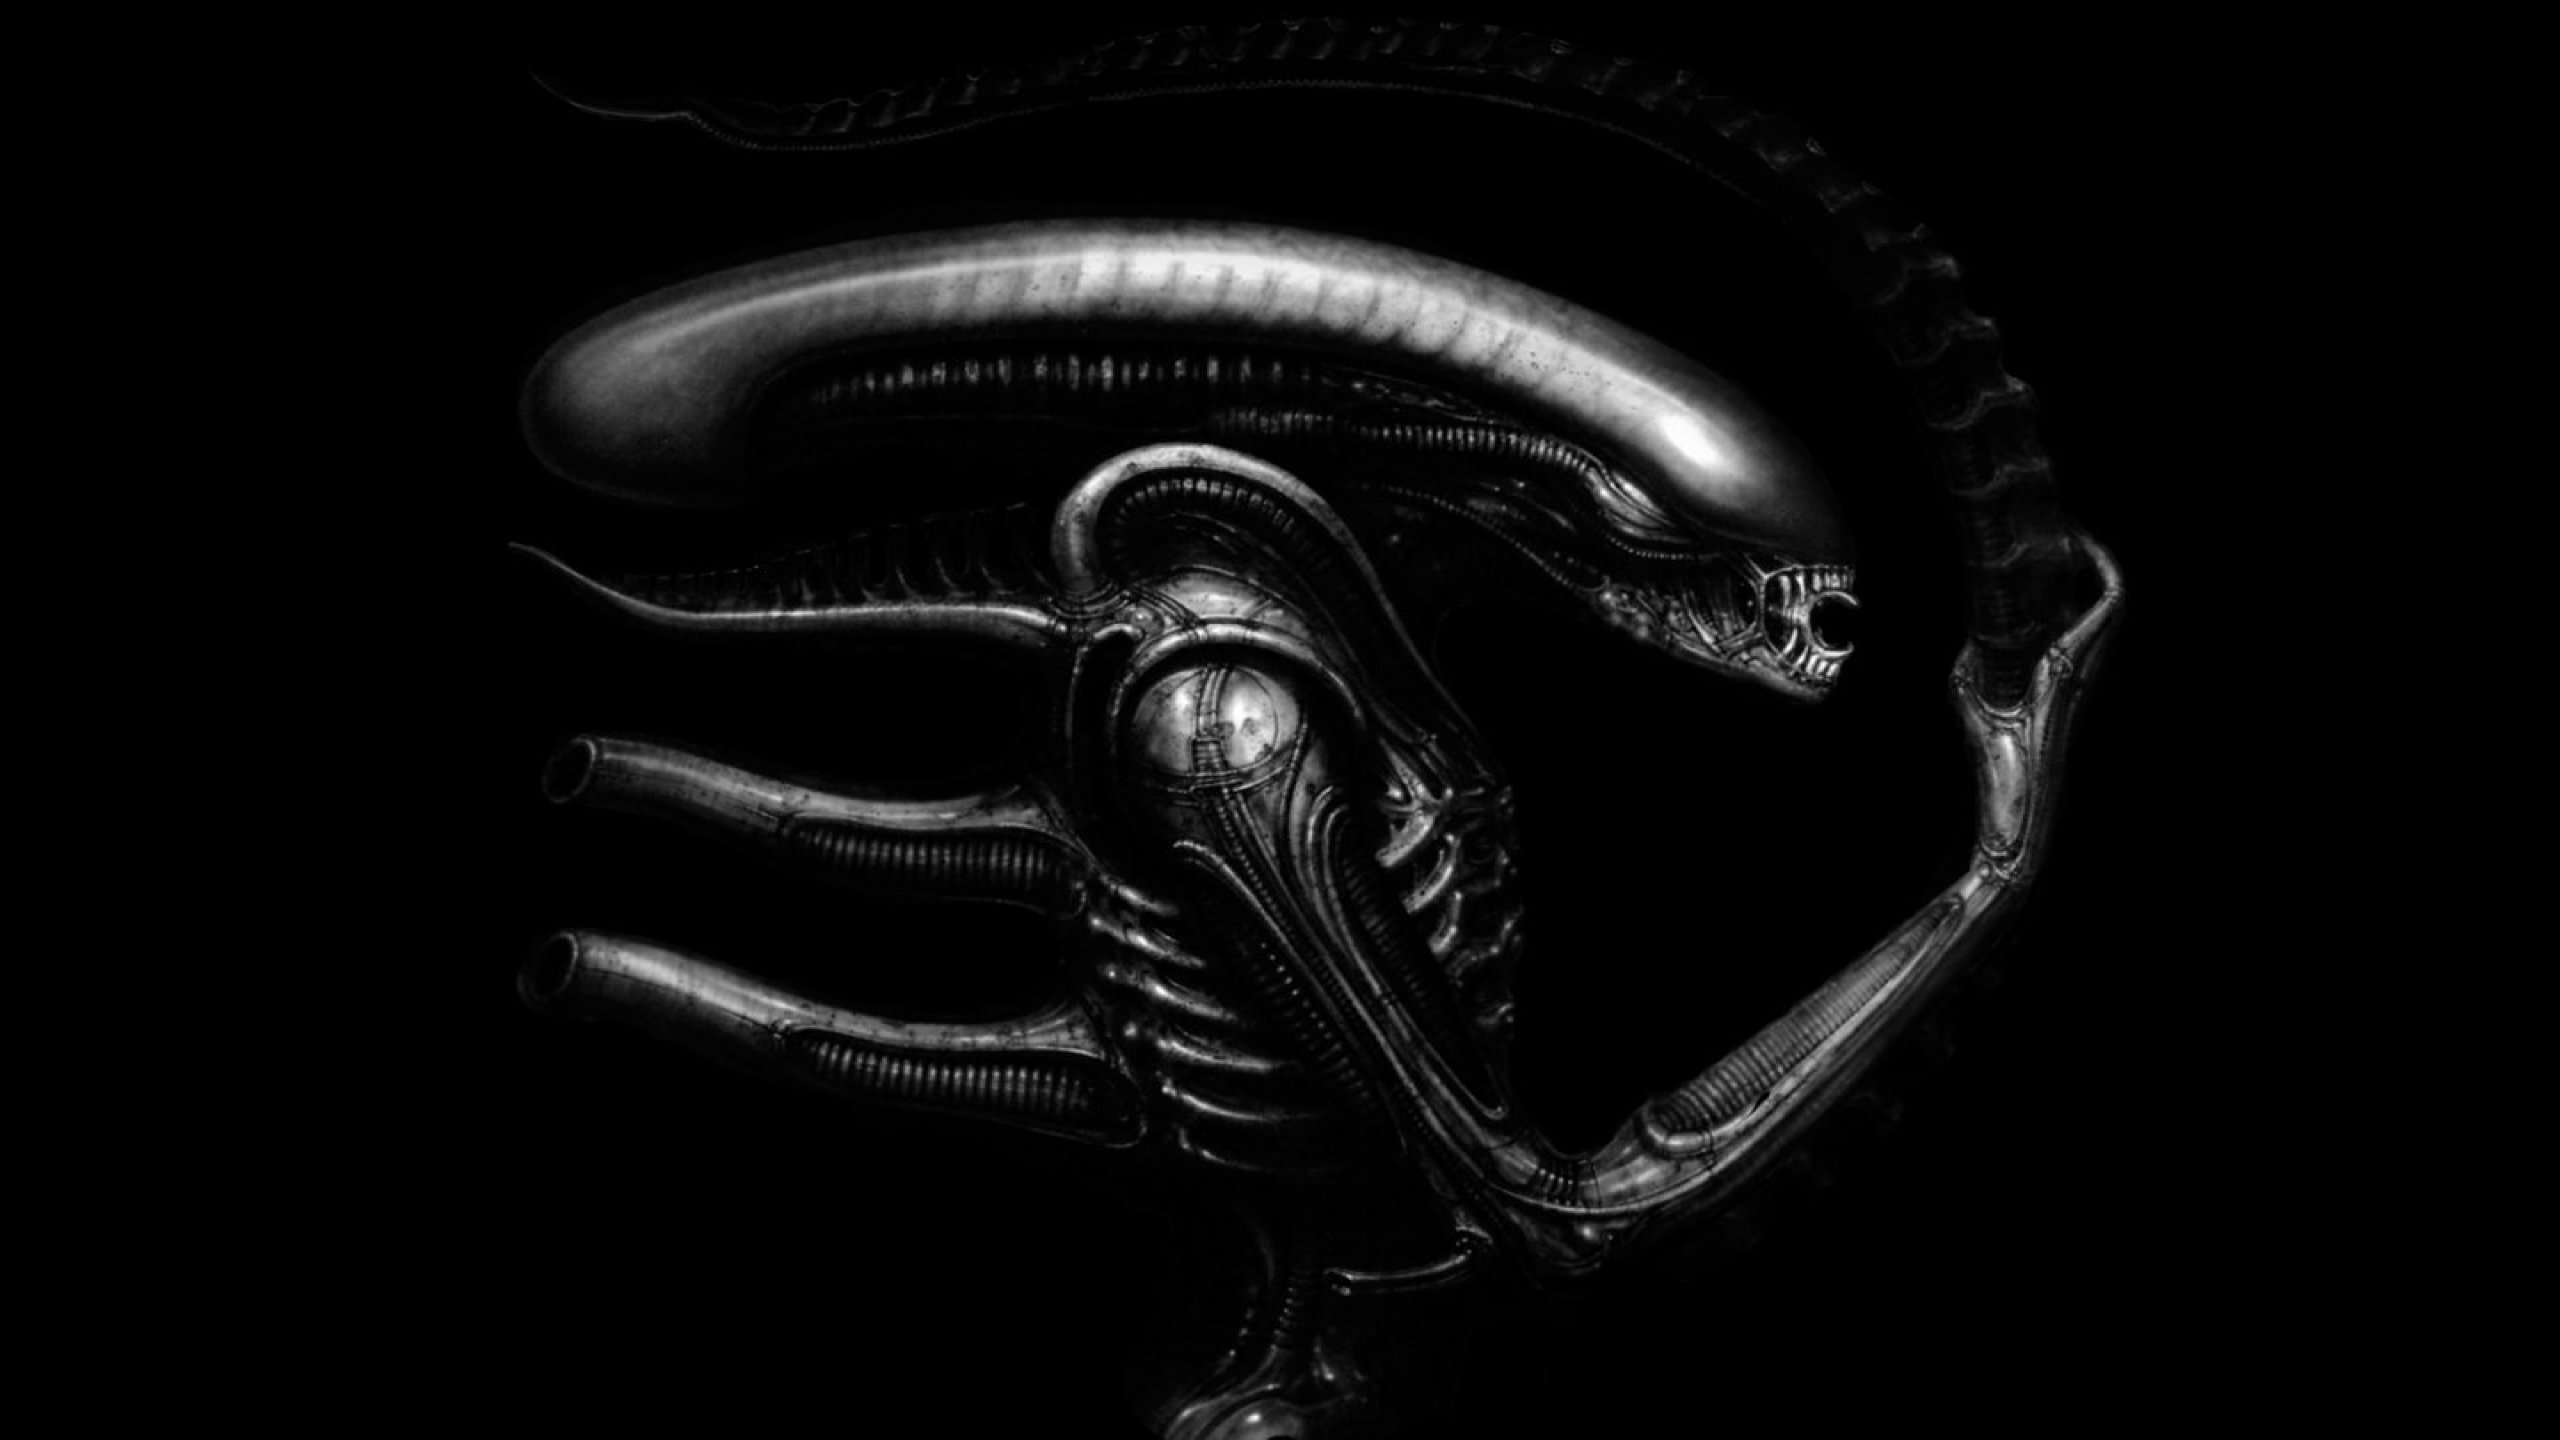 h r giger art artwork dark evil artistic horror fantasy